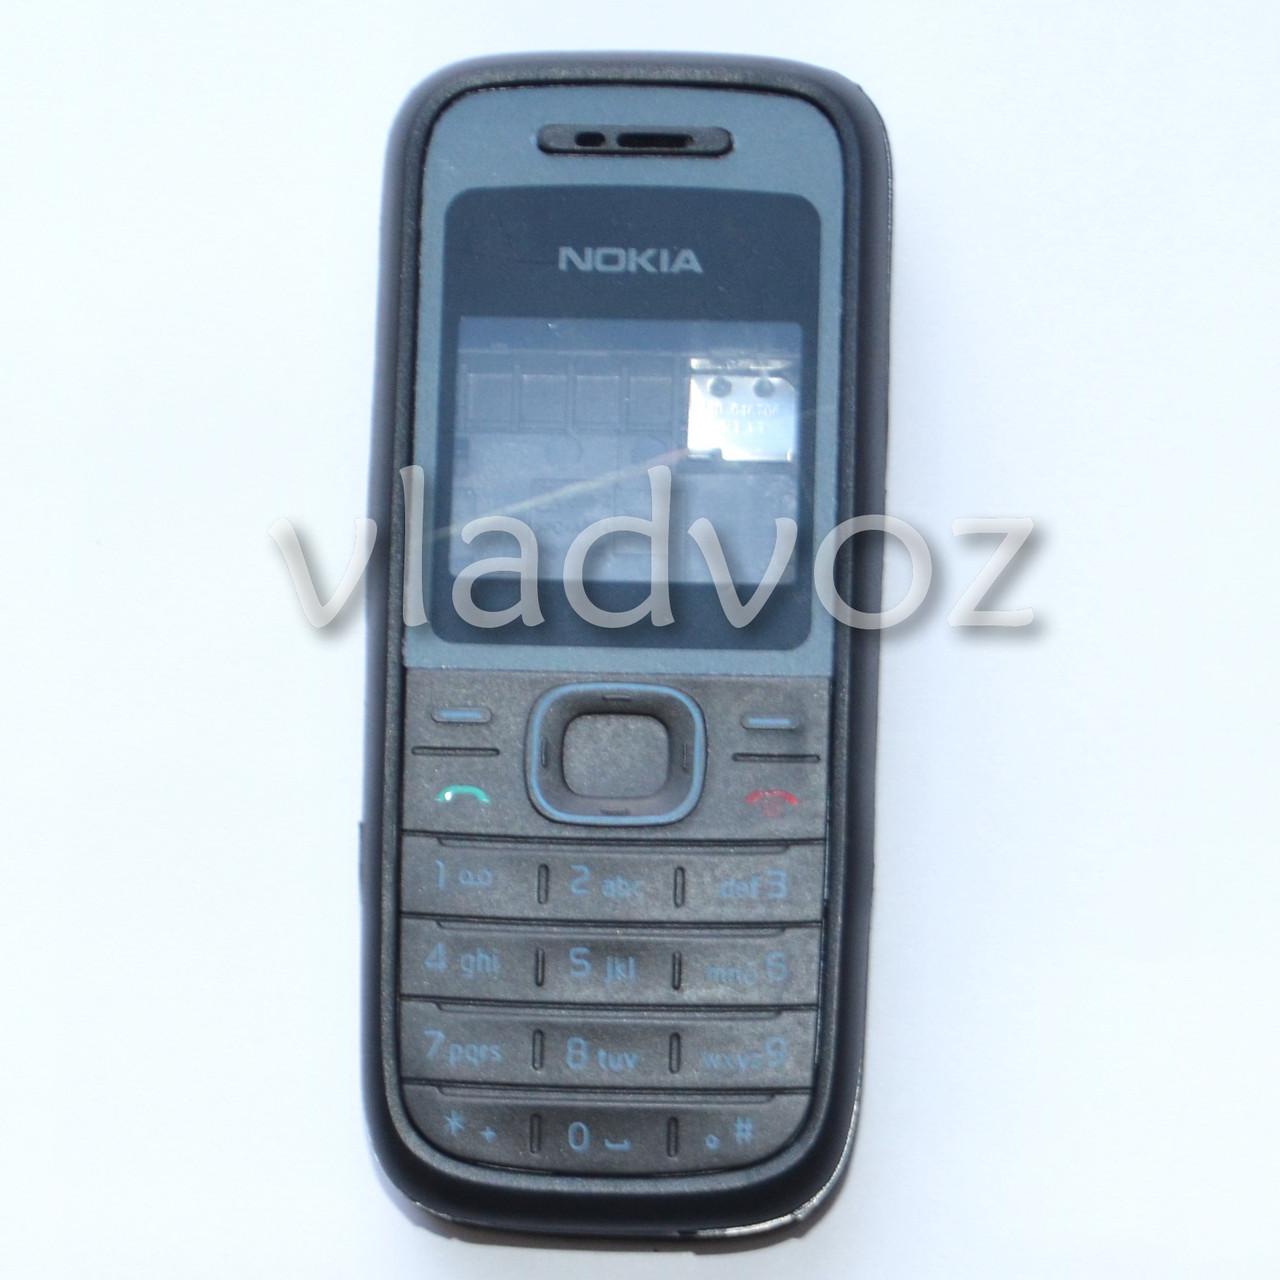 Корпус для Nokia 1208, 1200 чёрный с английской клавиатура AAA